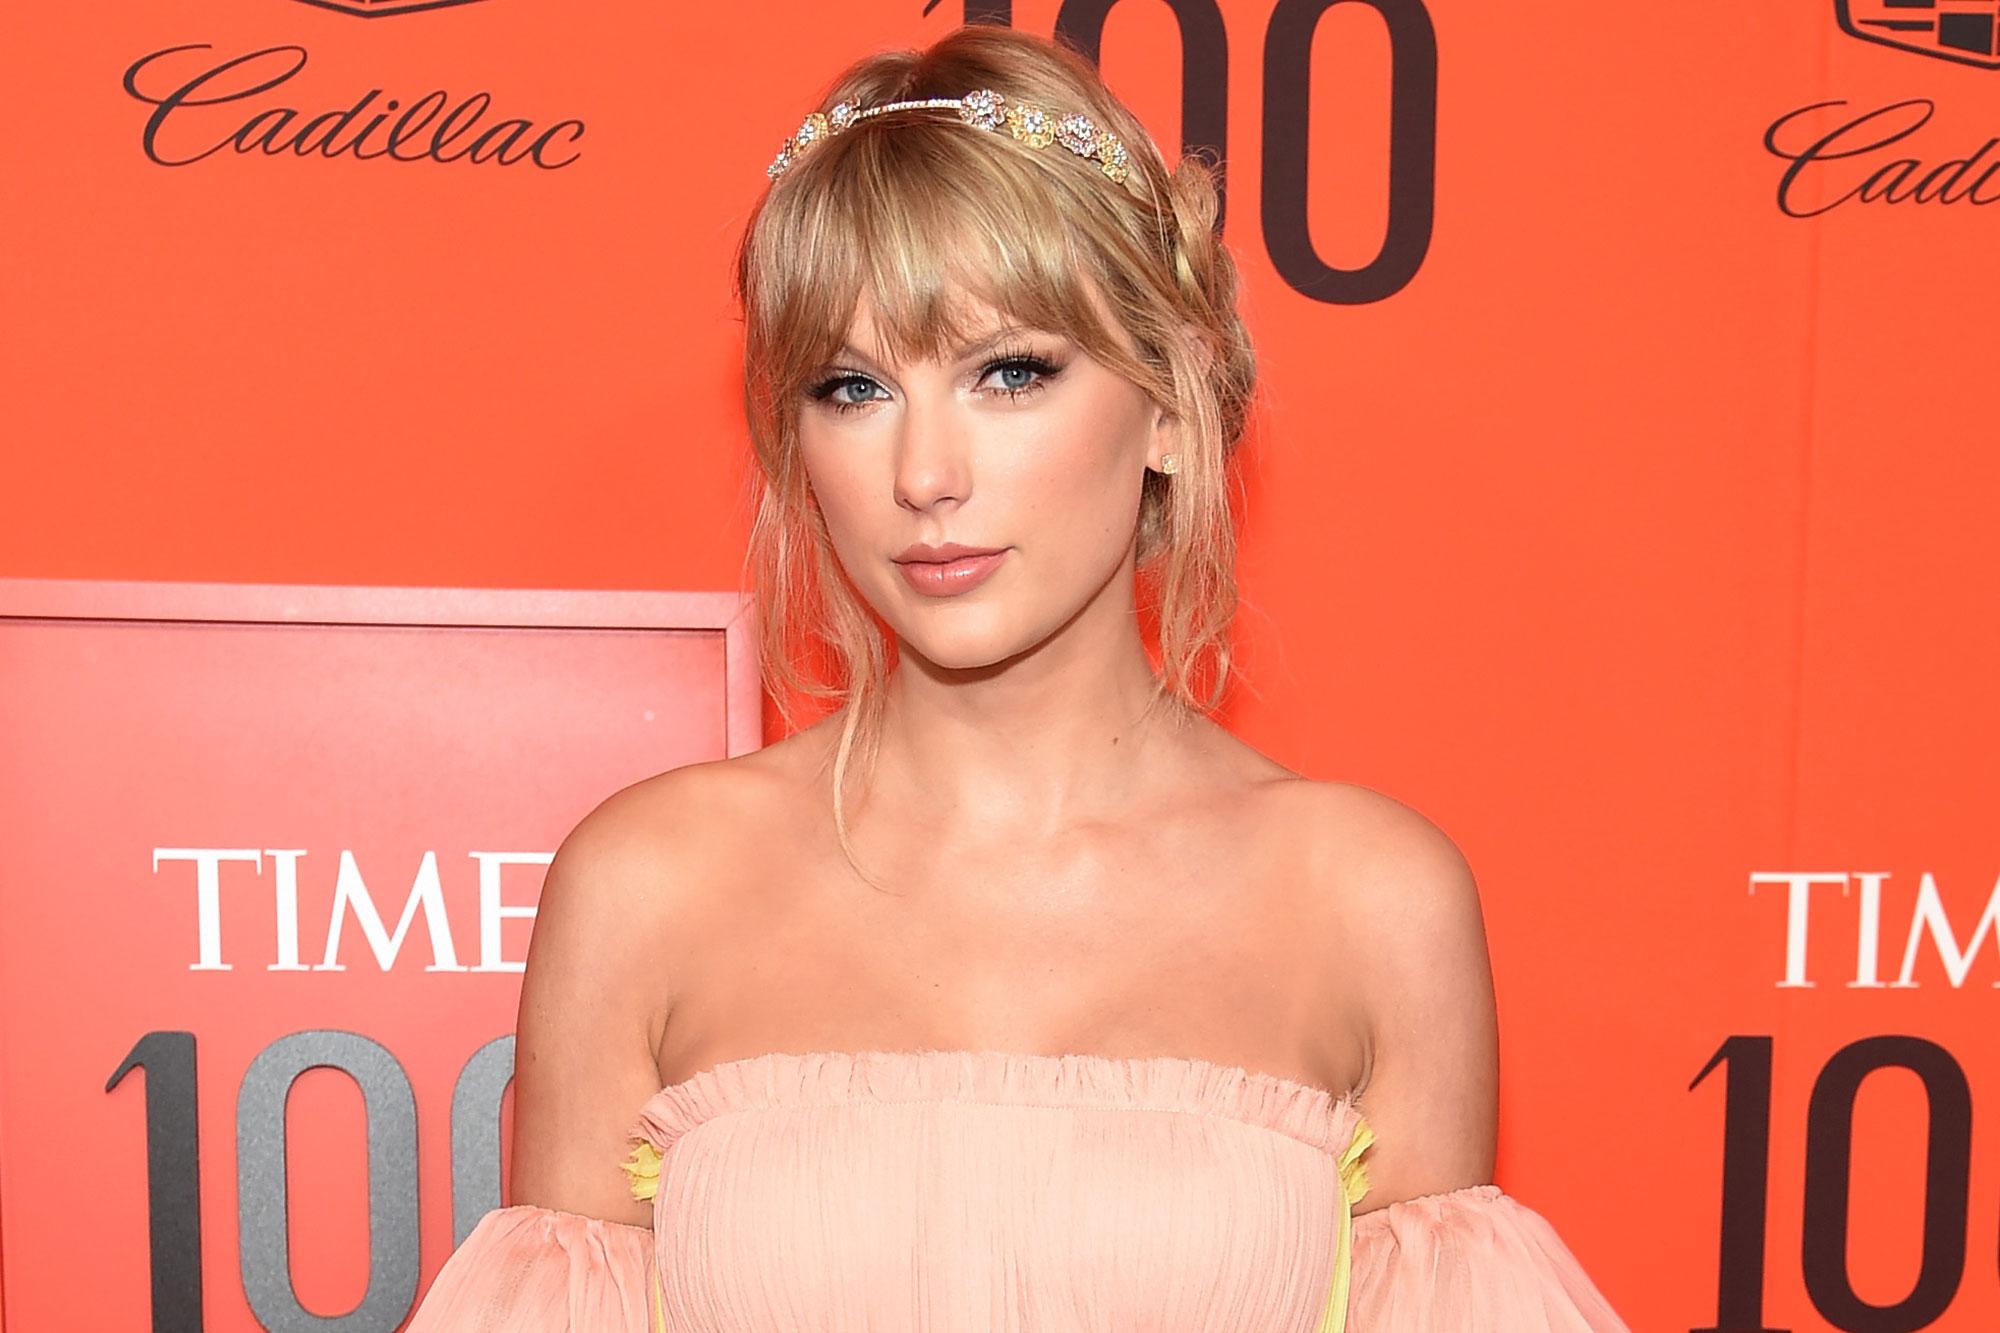 Taylor Swift S New Album Folklore Breaks New Record Ew Com